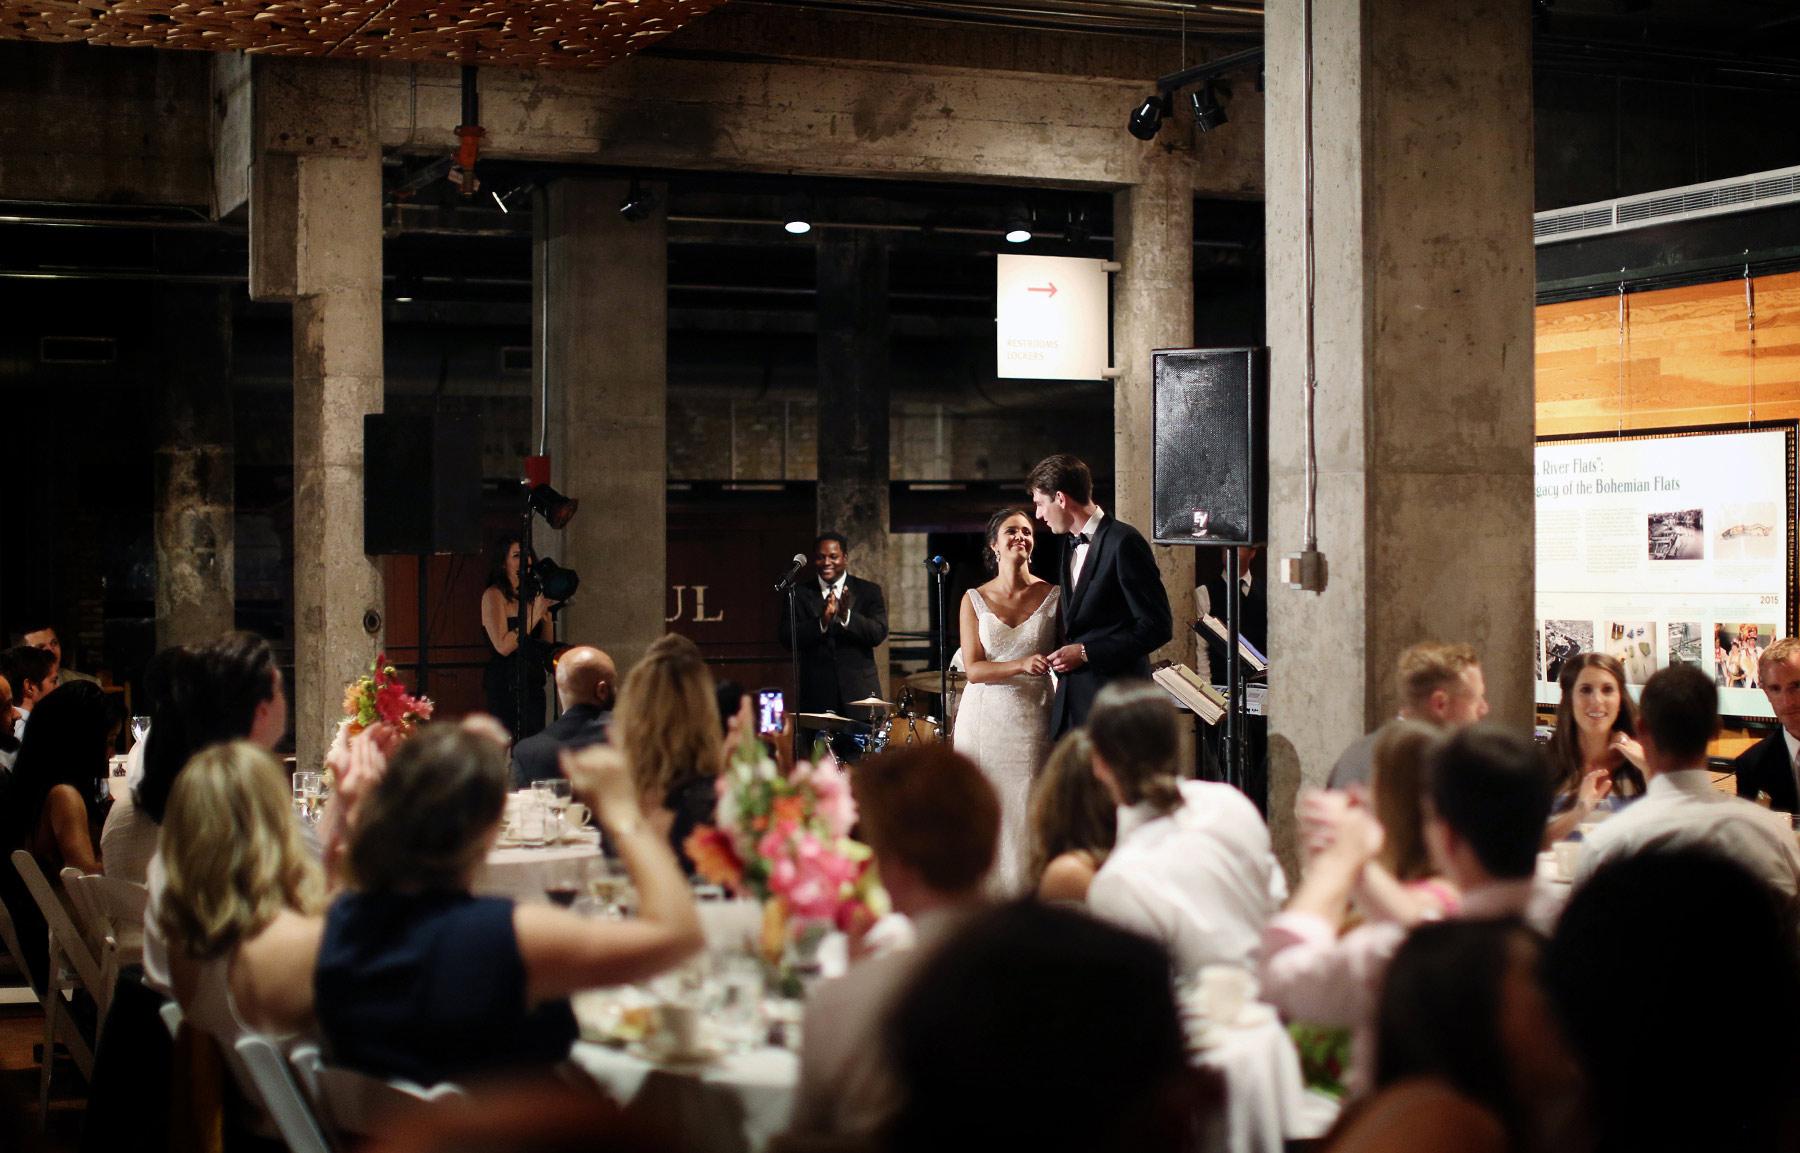 20-Minneapolis-Minnesota-Wedding-Photography-by-Vick-Photography-Downtown-Mill-City-Museum-Reception-Lalu-&-John.jpg